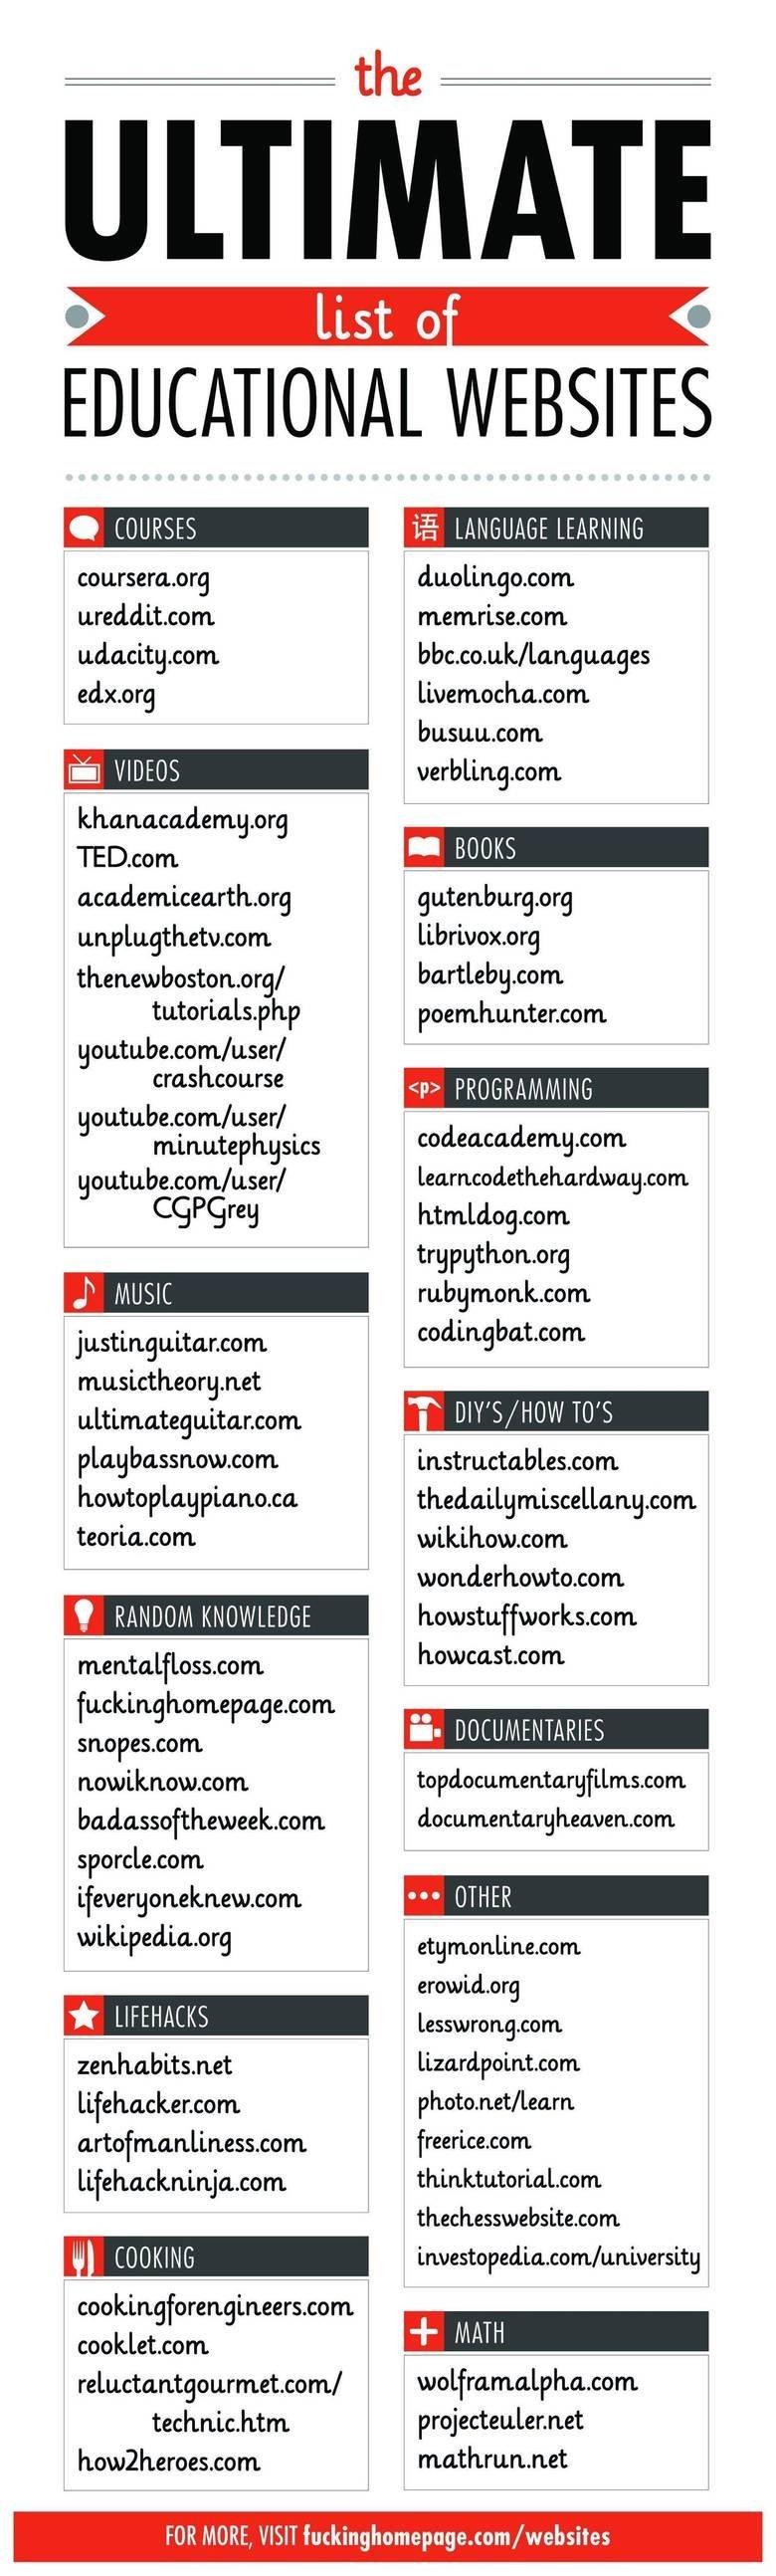 need some help?. . q list CE q EDUCATIONAL WEBSITES u, COURSES cou. rseja.. org creddit. corra edx. org E VIDEOS TED. com. corra tutor' Lals. php rowser/ crashc